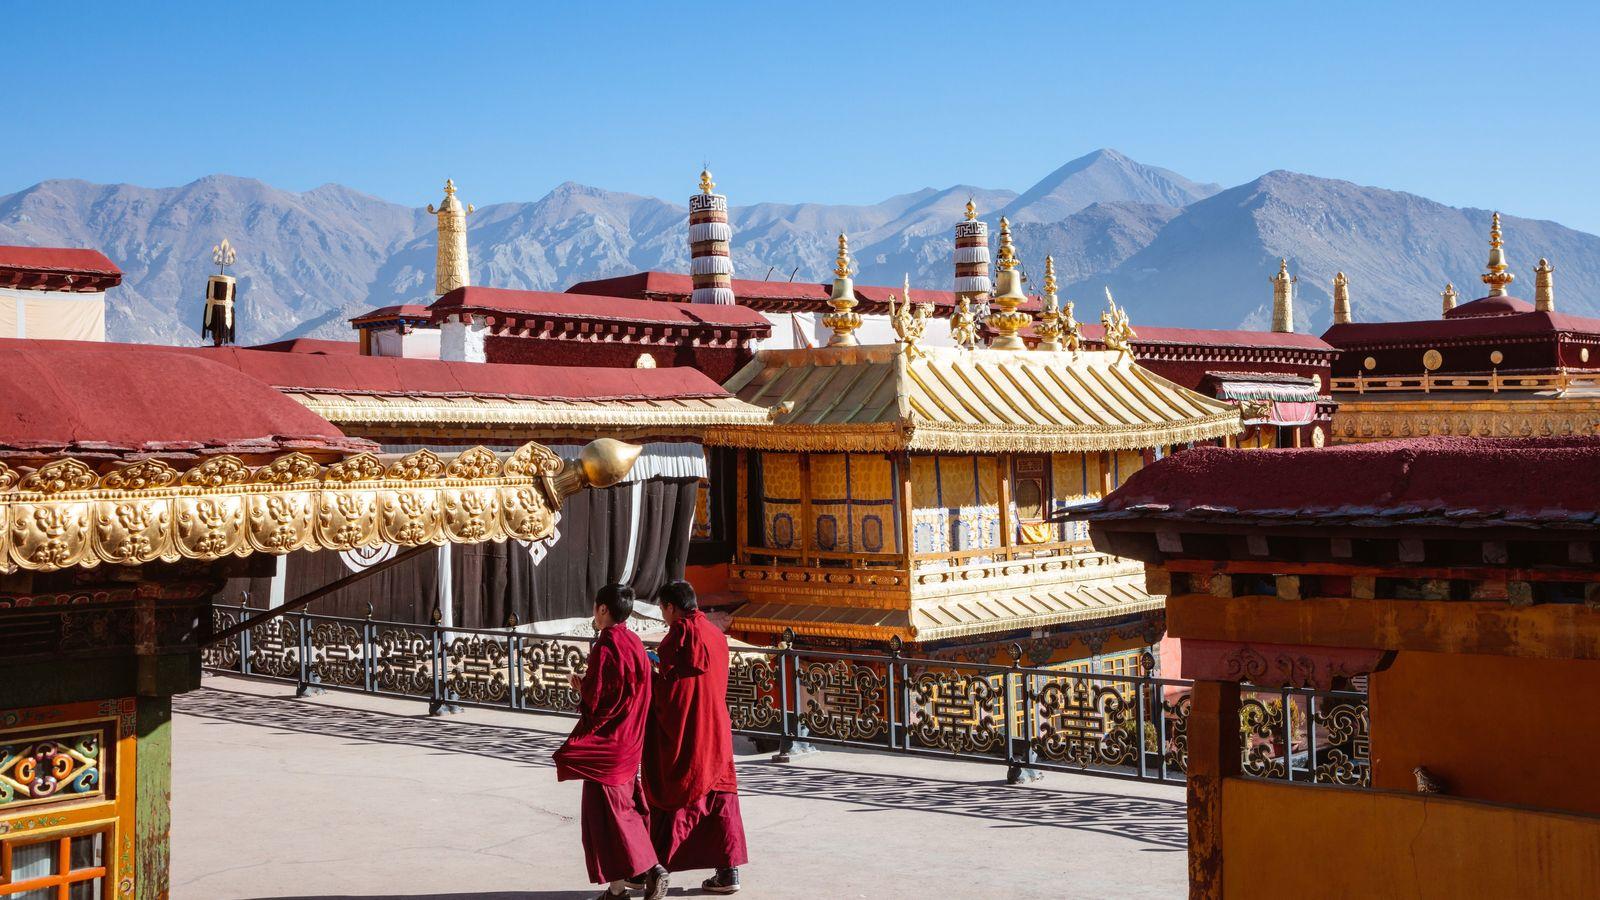 Resident monks stroll through Jokhang Temple, Lhasa, an important destination of Tibetan Buddhist pilgrims.